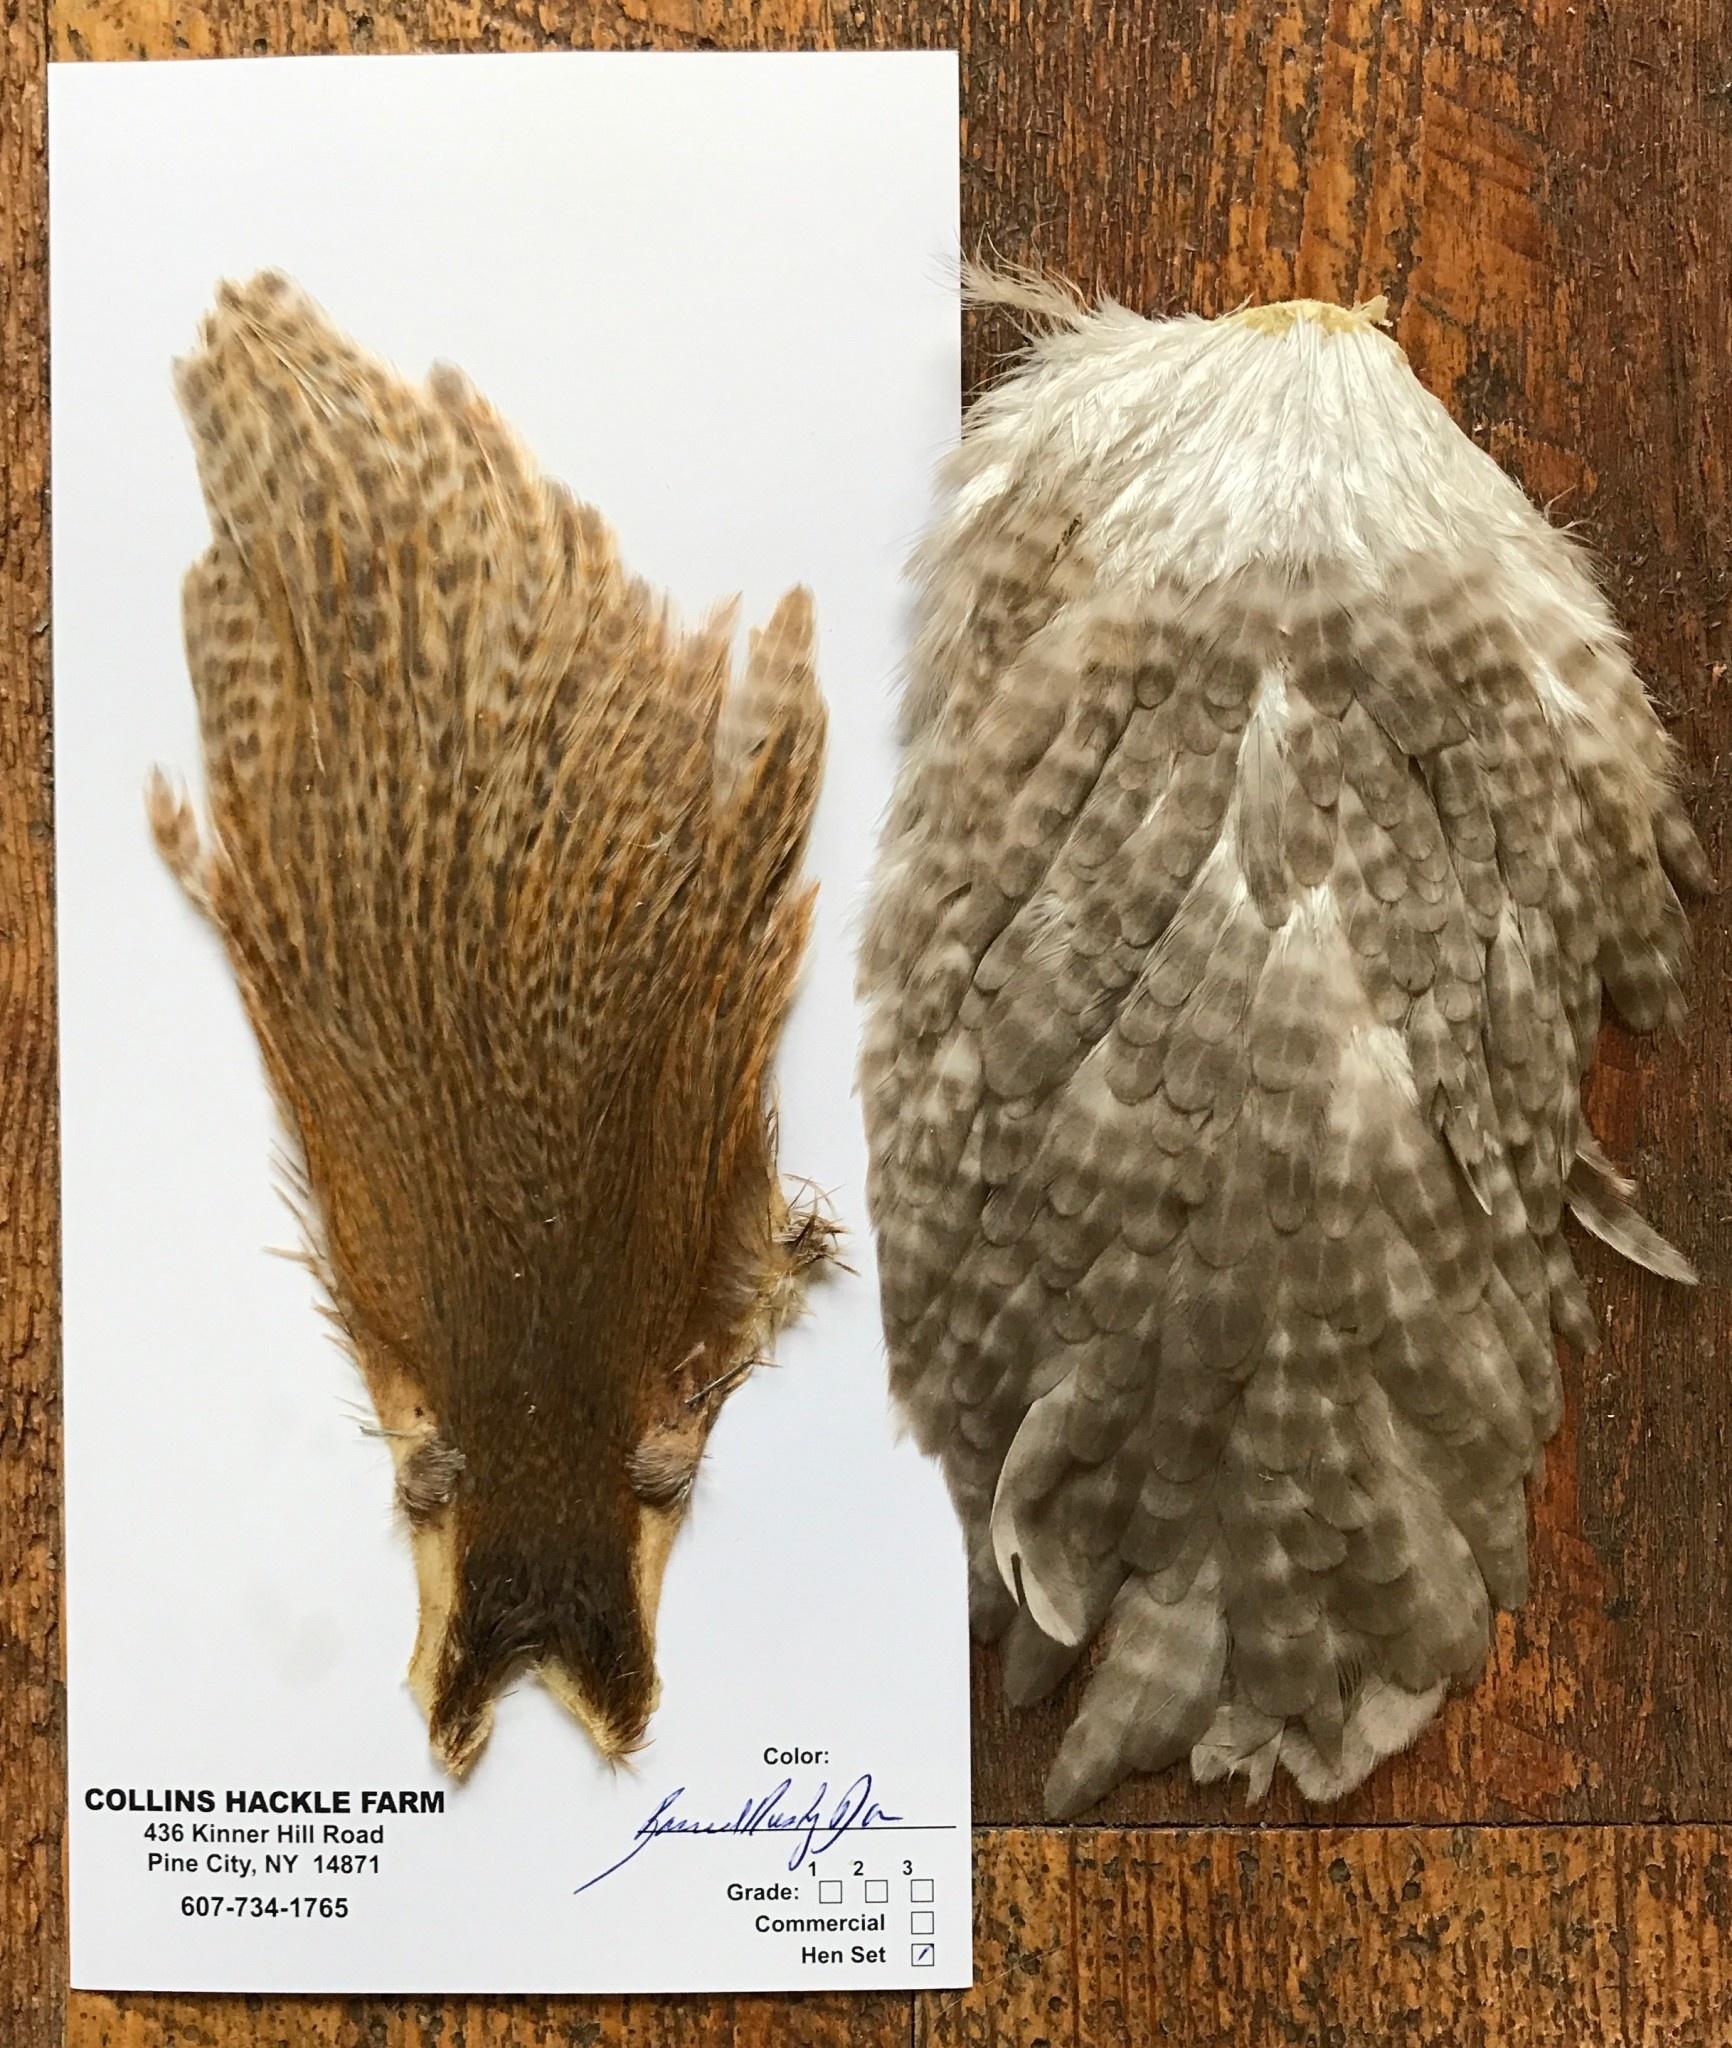 Collins Hen Cape/Saddle Barred Rusty Dun